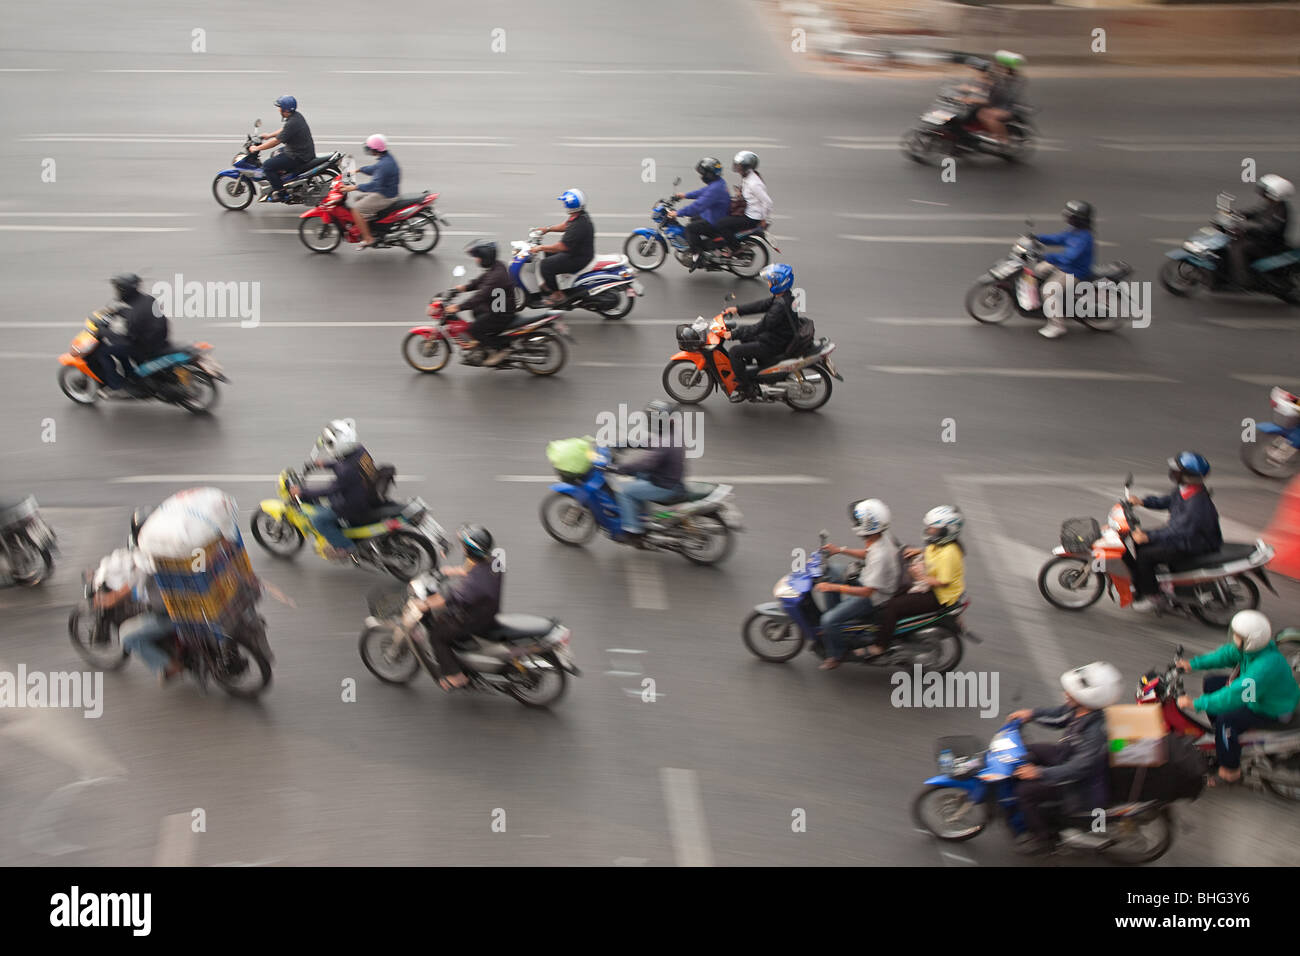 Motorcycles in bangkok - Stock Image